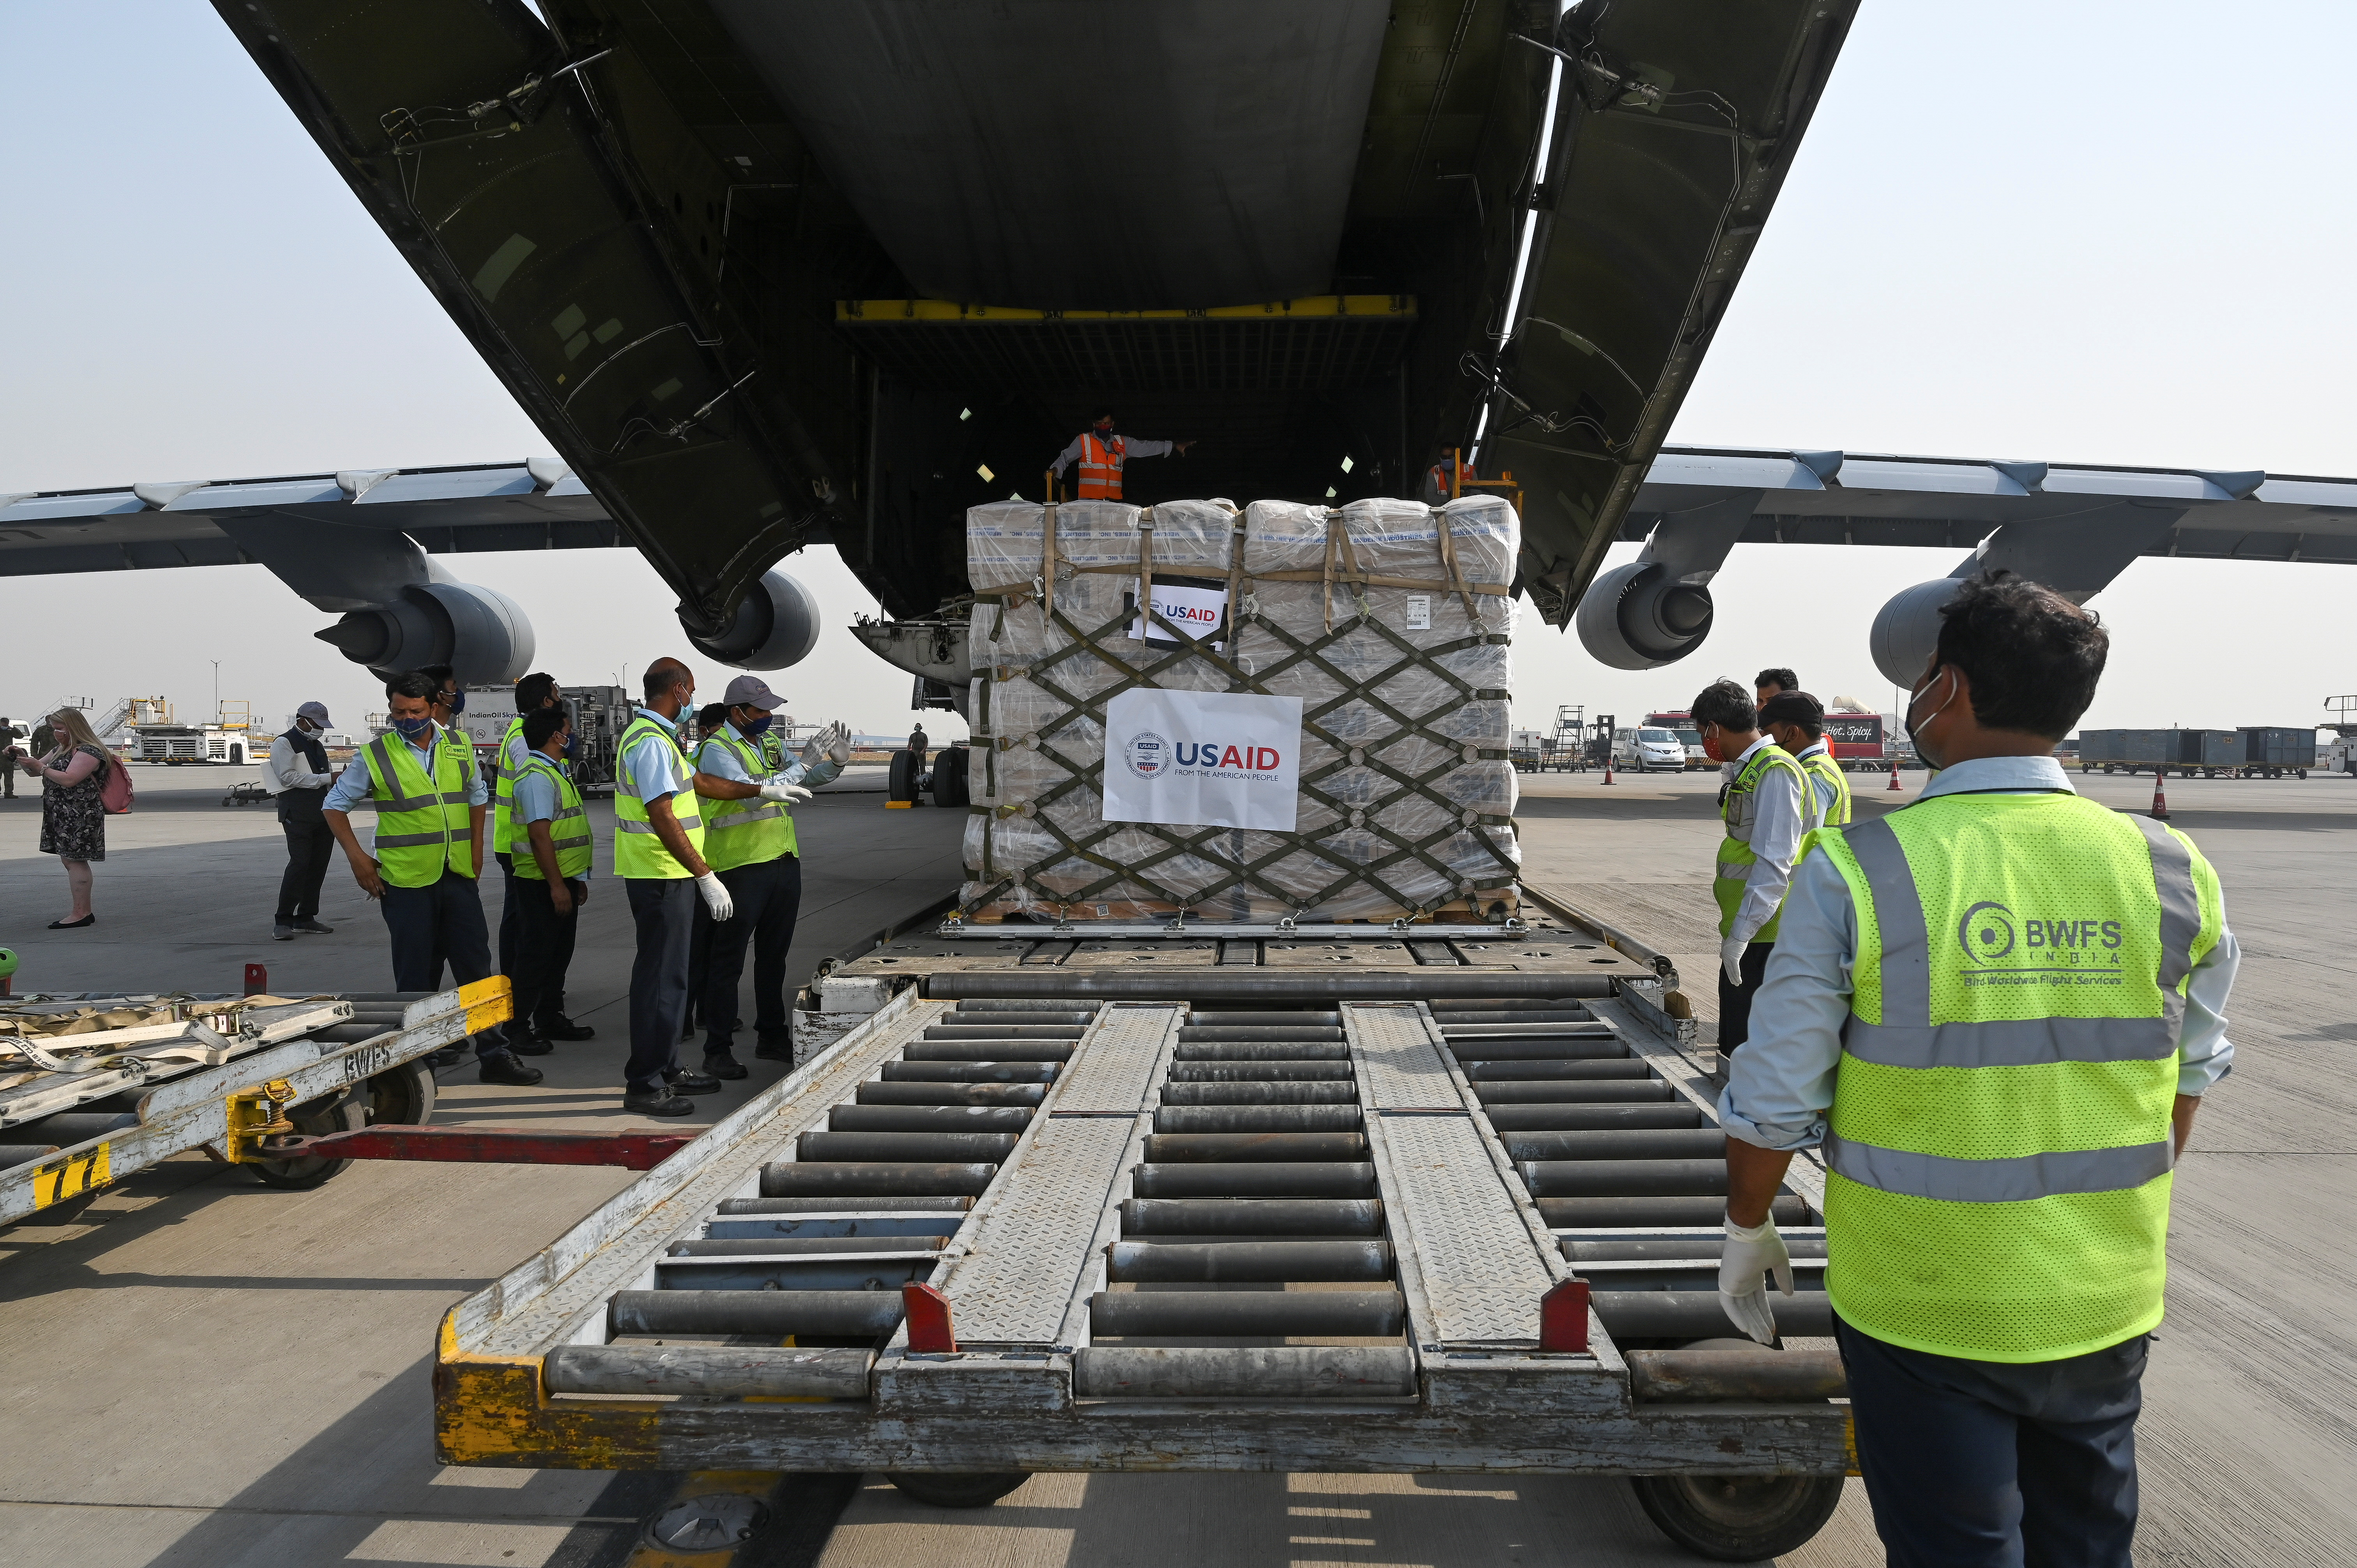 Ground staff unload coronavirus disease (COVID-19) relief supplies from the United States at the Indira Gandhi International Airport cargo terminal in New Delhi, India April 30, 2021. Prakash Singh/Pool via REUTERS